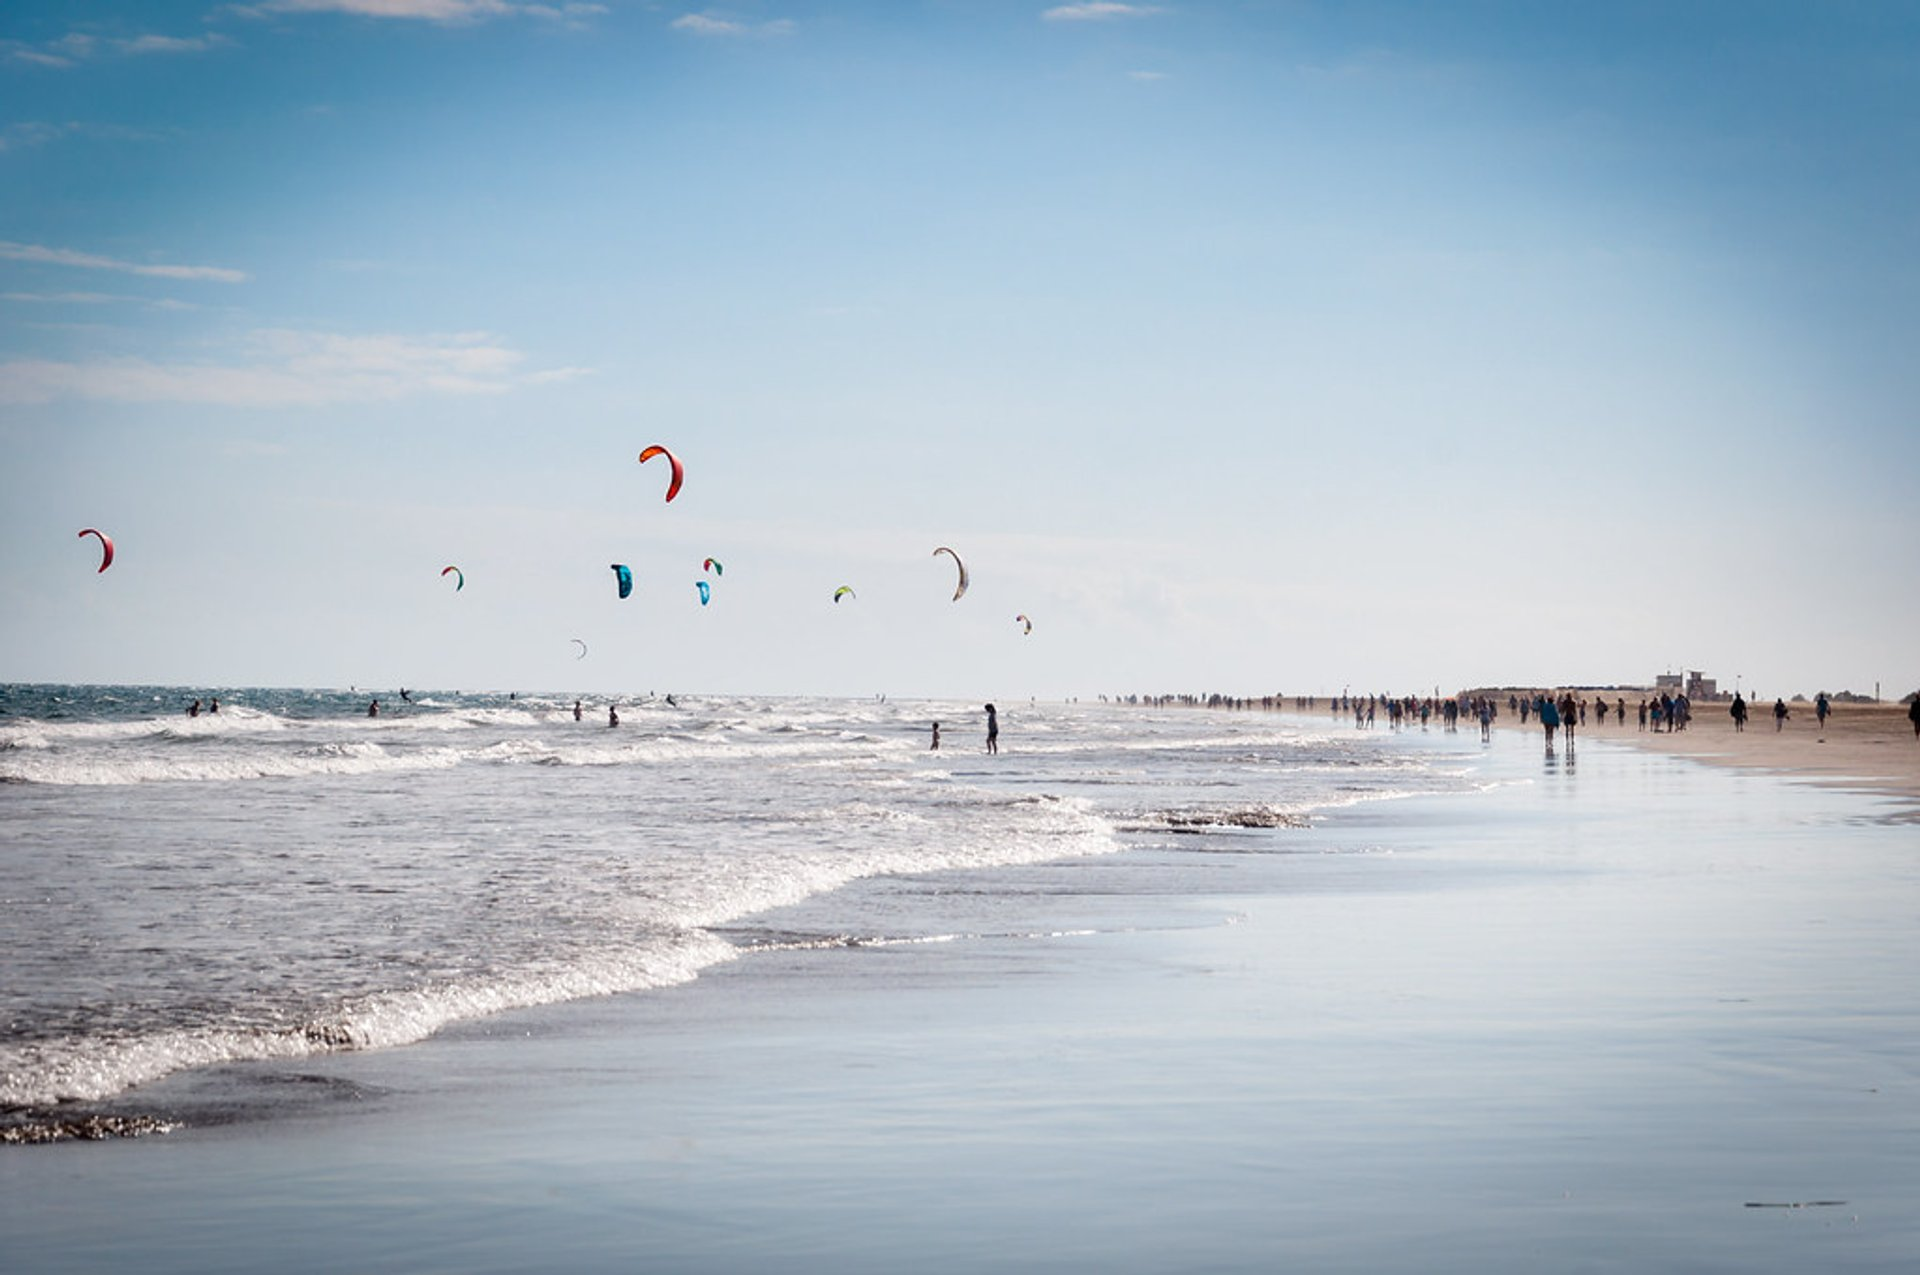 Kitesurfing at Playa del Ingles in Gran Canaria 2020